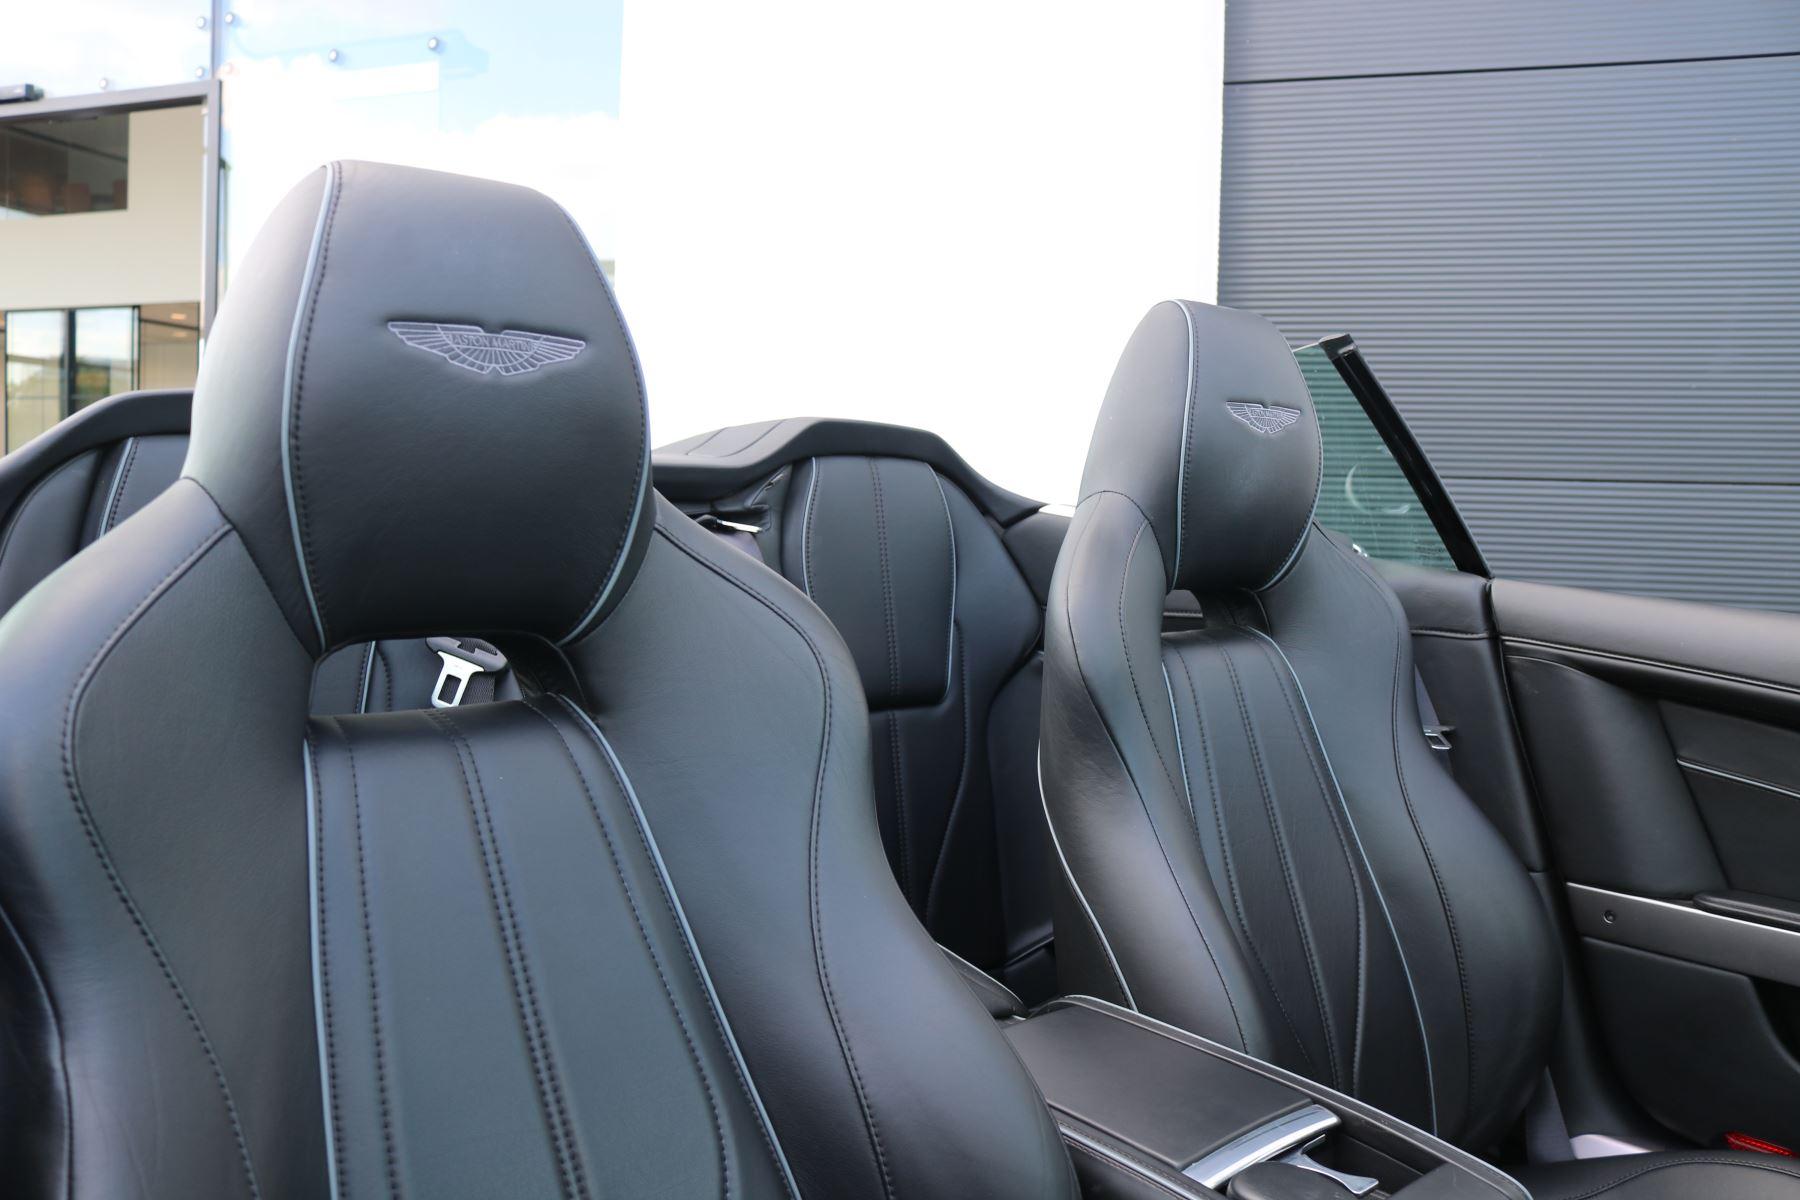 Aston Martin Virage V12 2dr Volante Touchtronic image 16